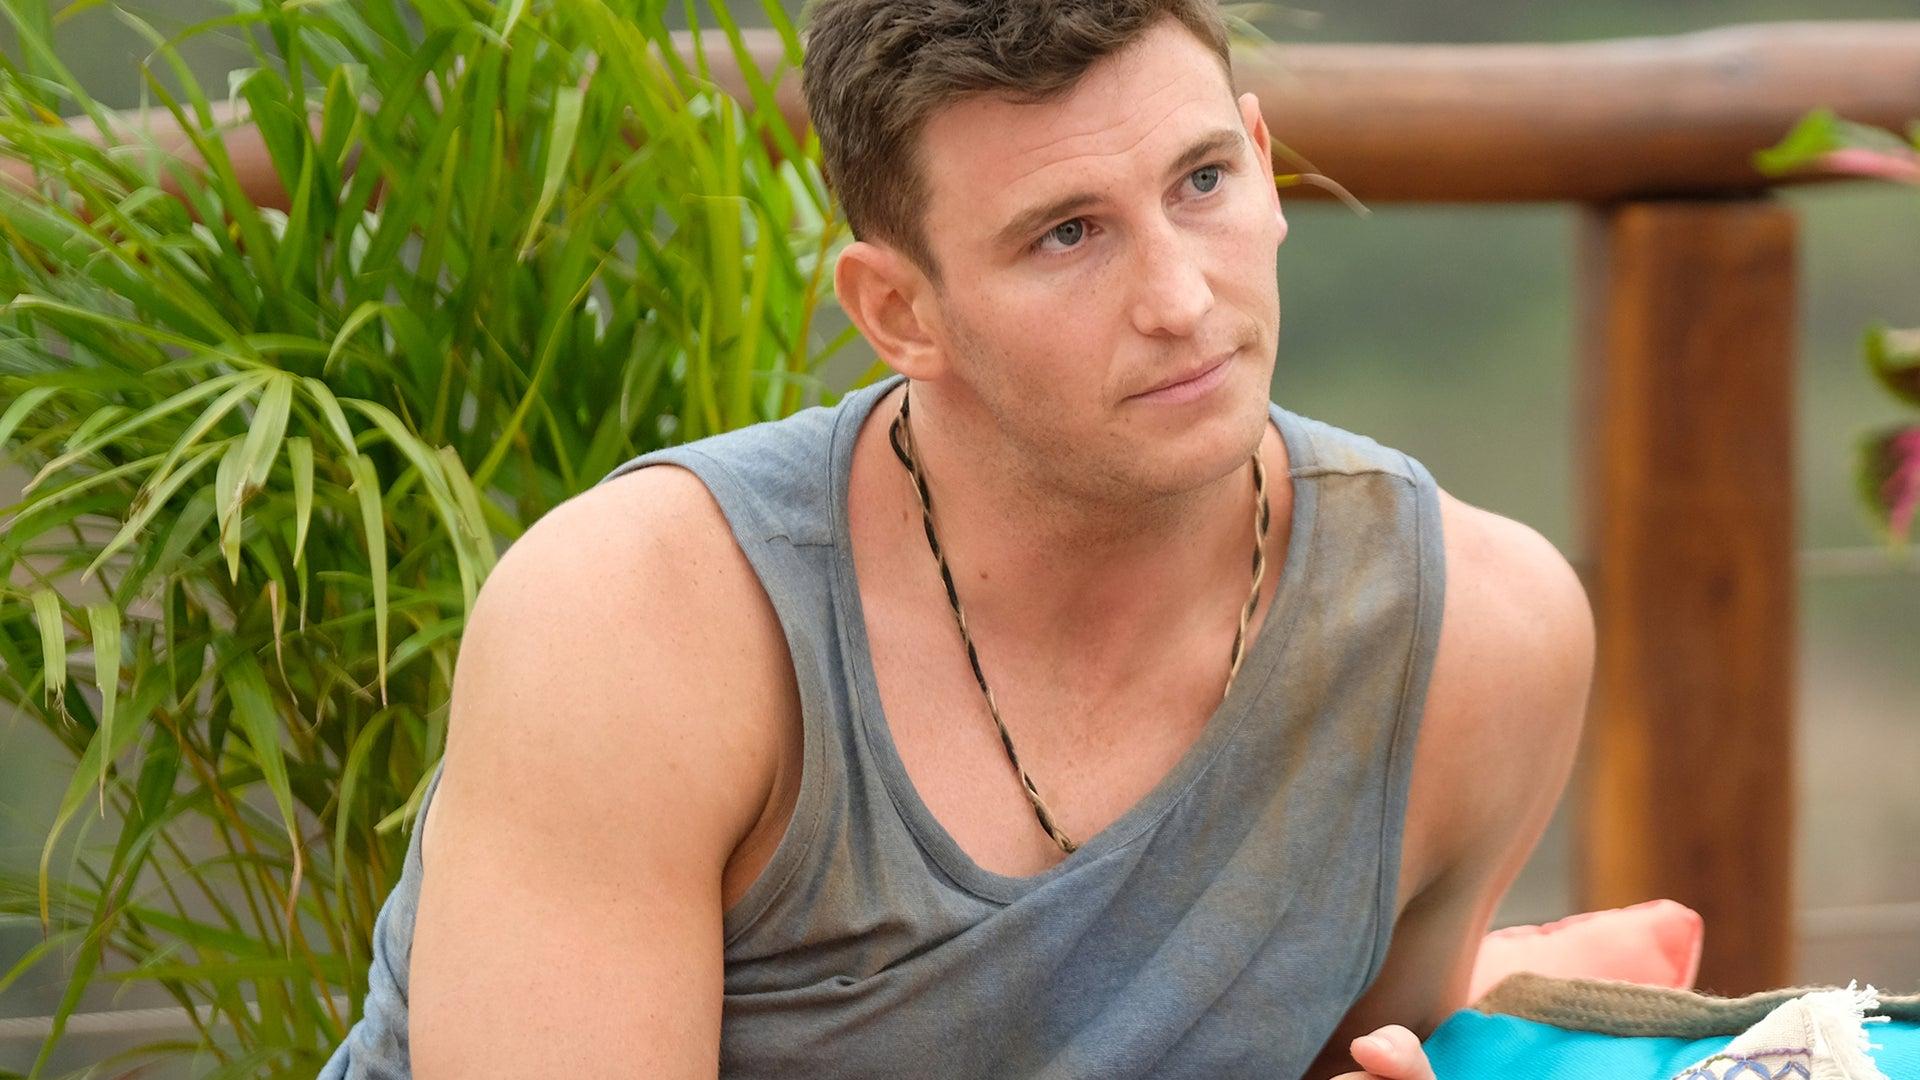 Blake, Bachelor in Paradise